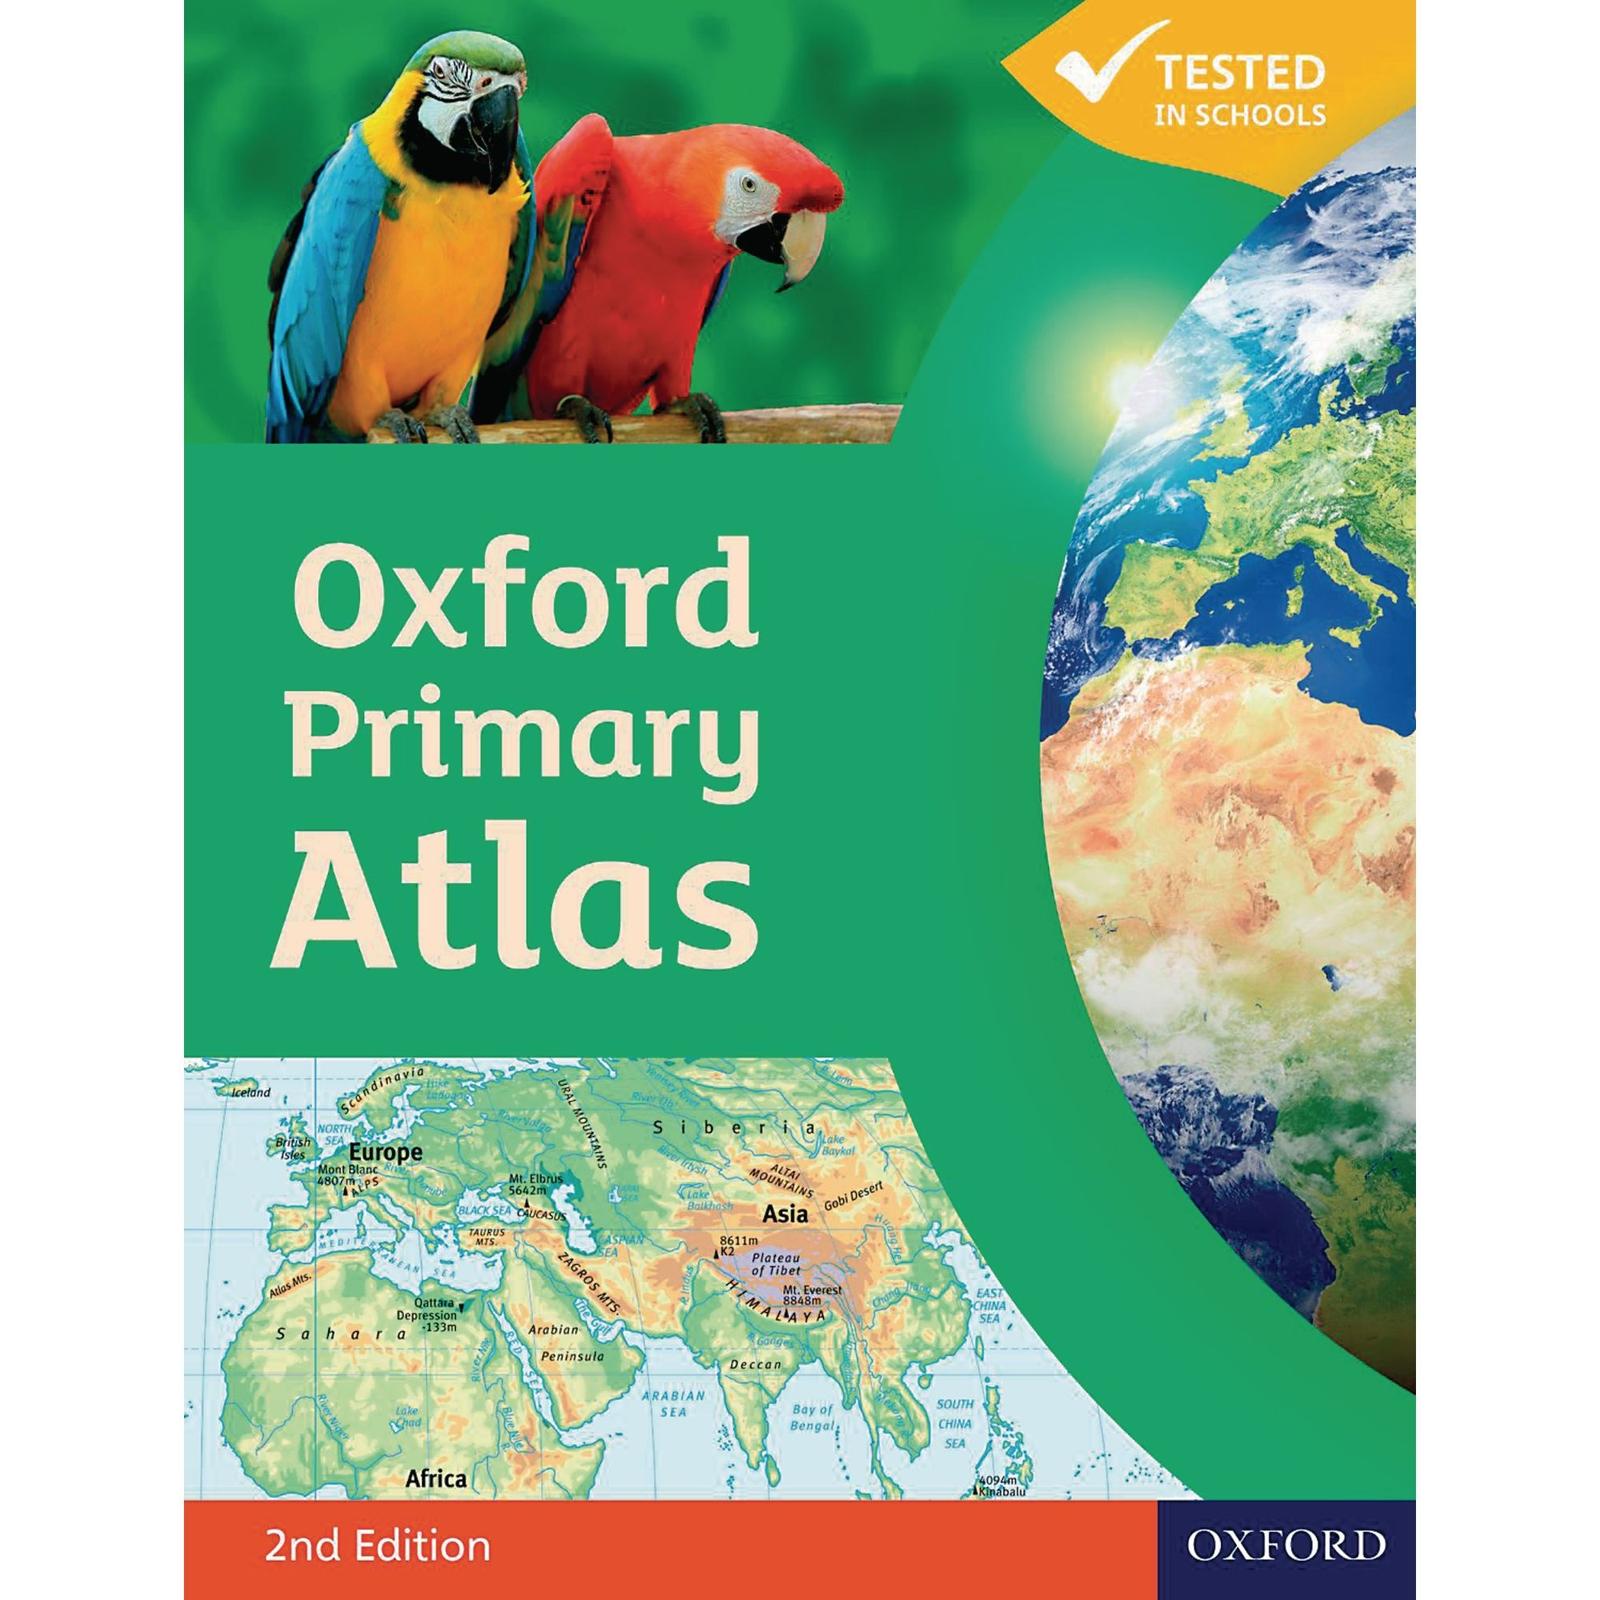 Oxford Primary Atlas